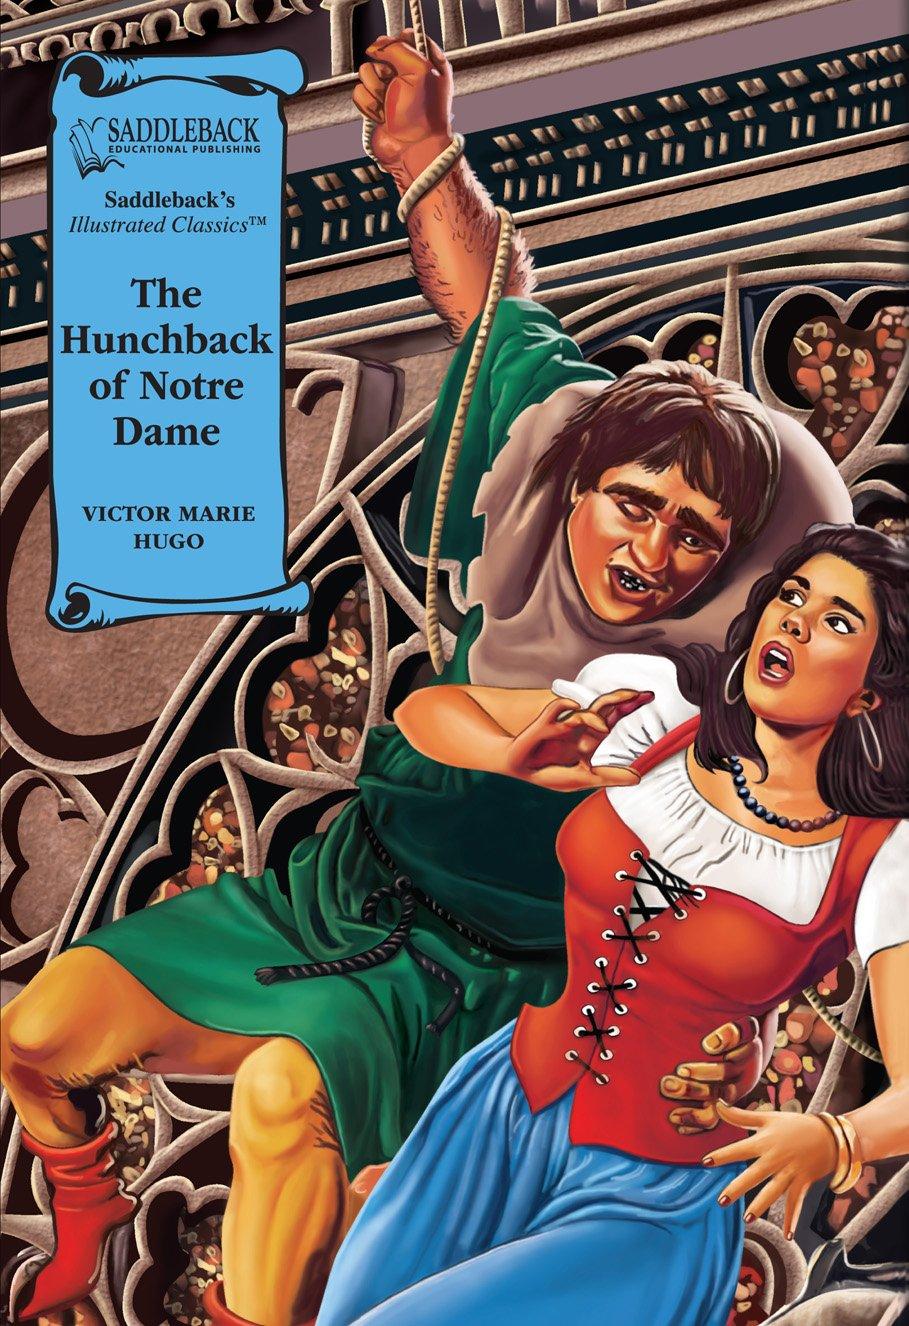 Read Online The Hunchback of Notre Dame (Illus. Classics) HARDCOVER (Saddleback's Illustrated Classics) pdf epub